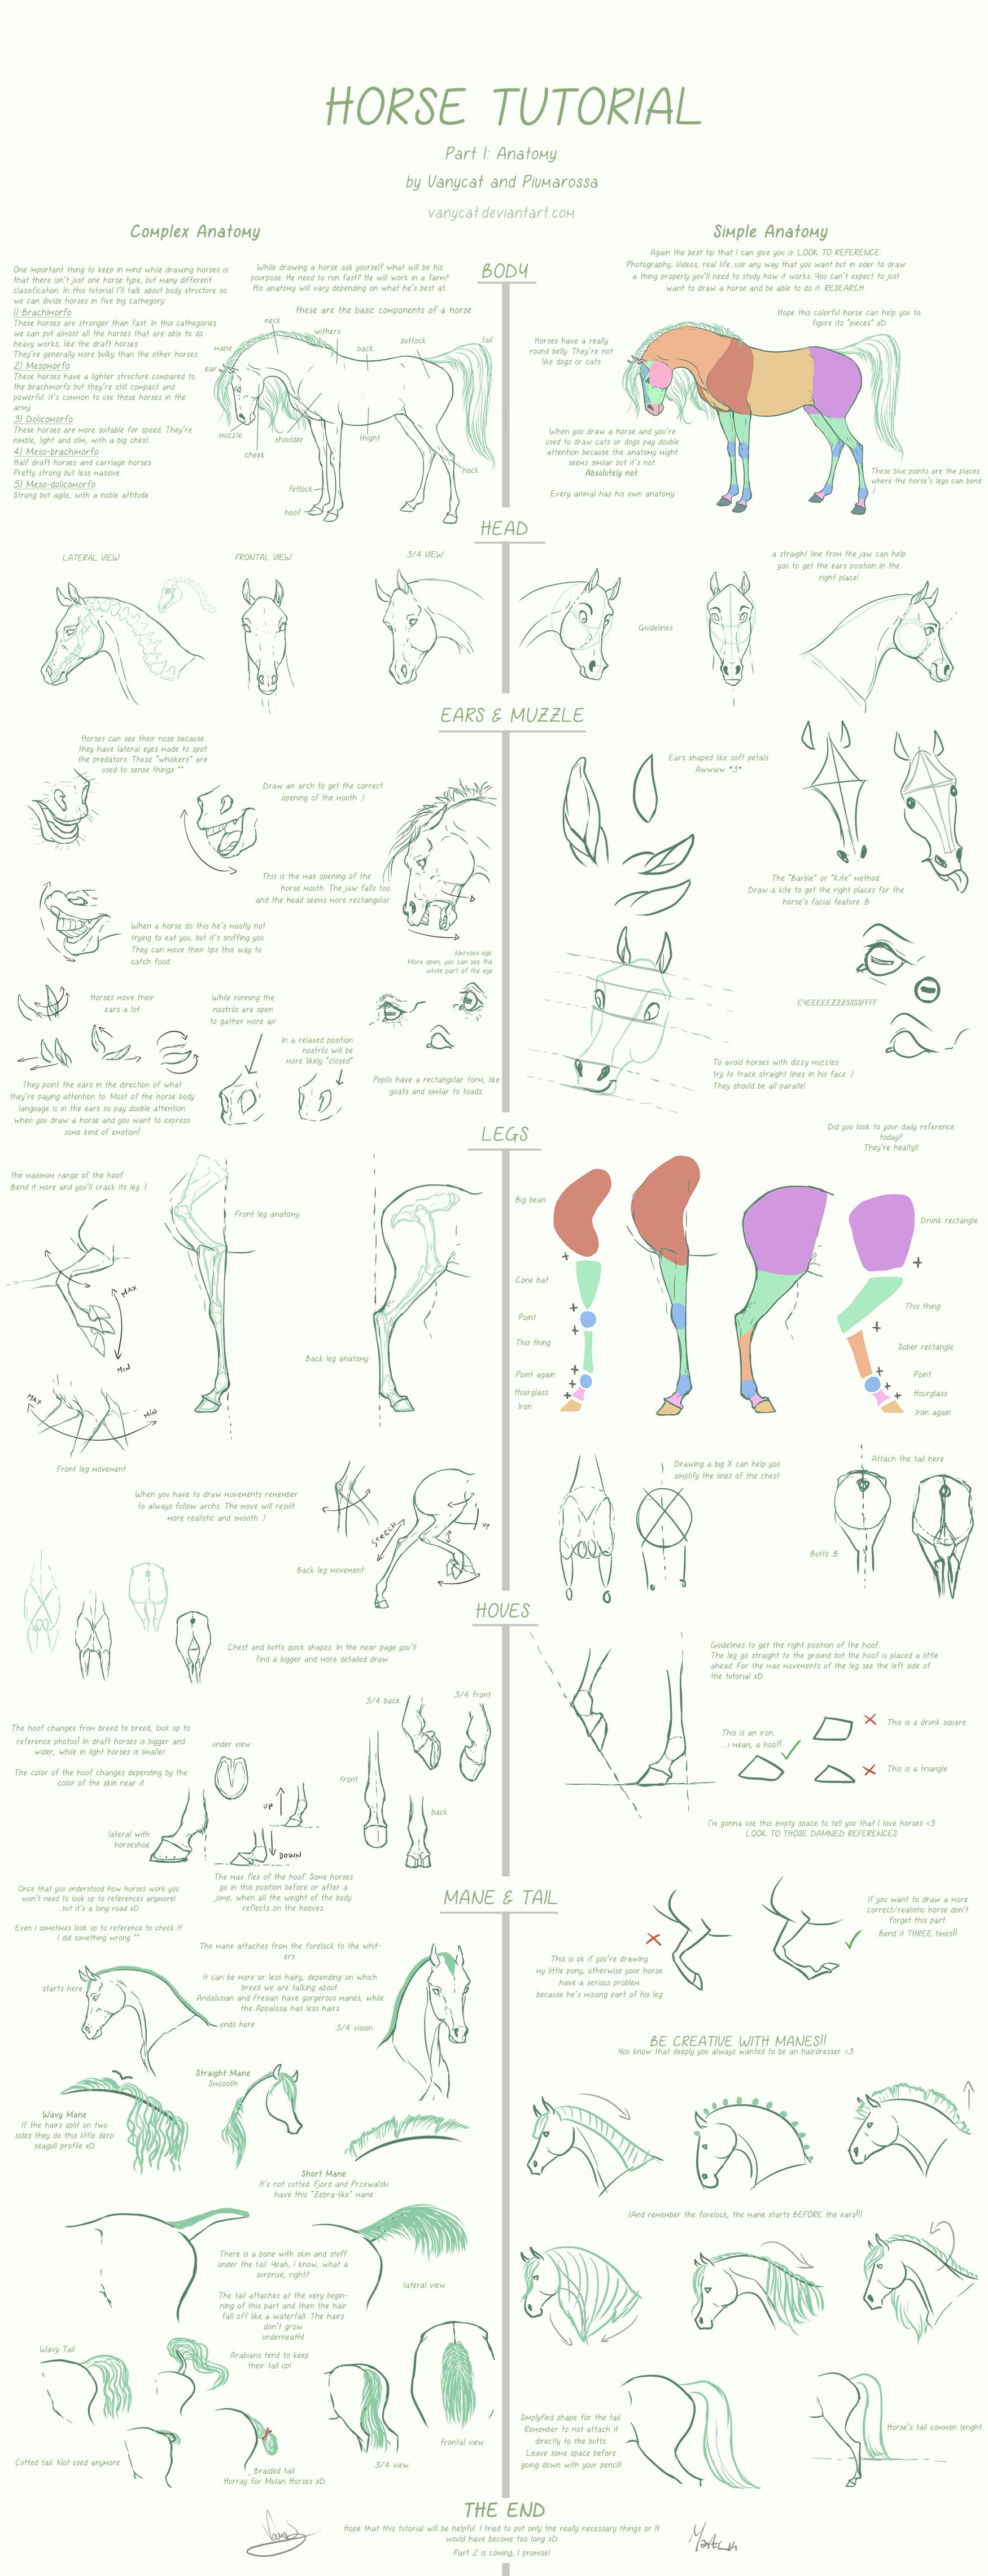 Horse Tutorial Part 1 (Anatomy) by Vanycat by VanyCat on DeviantArt